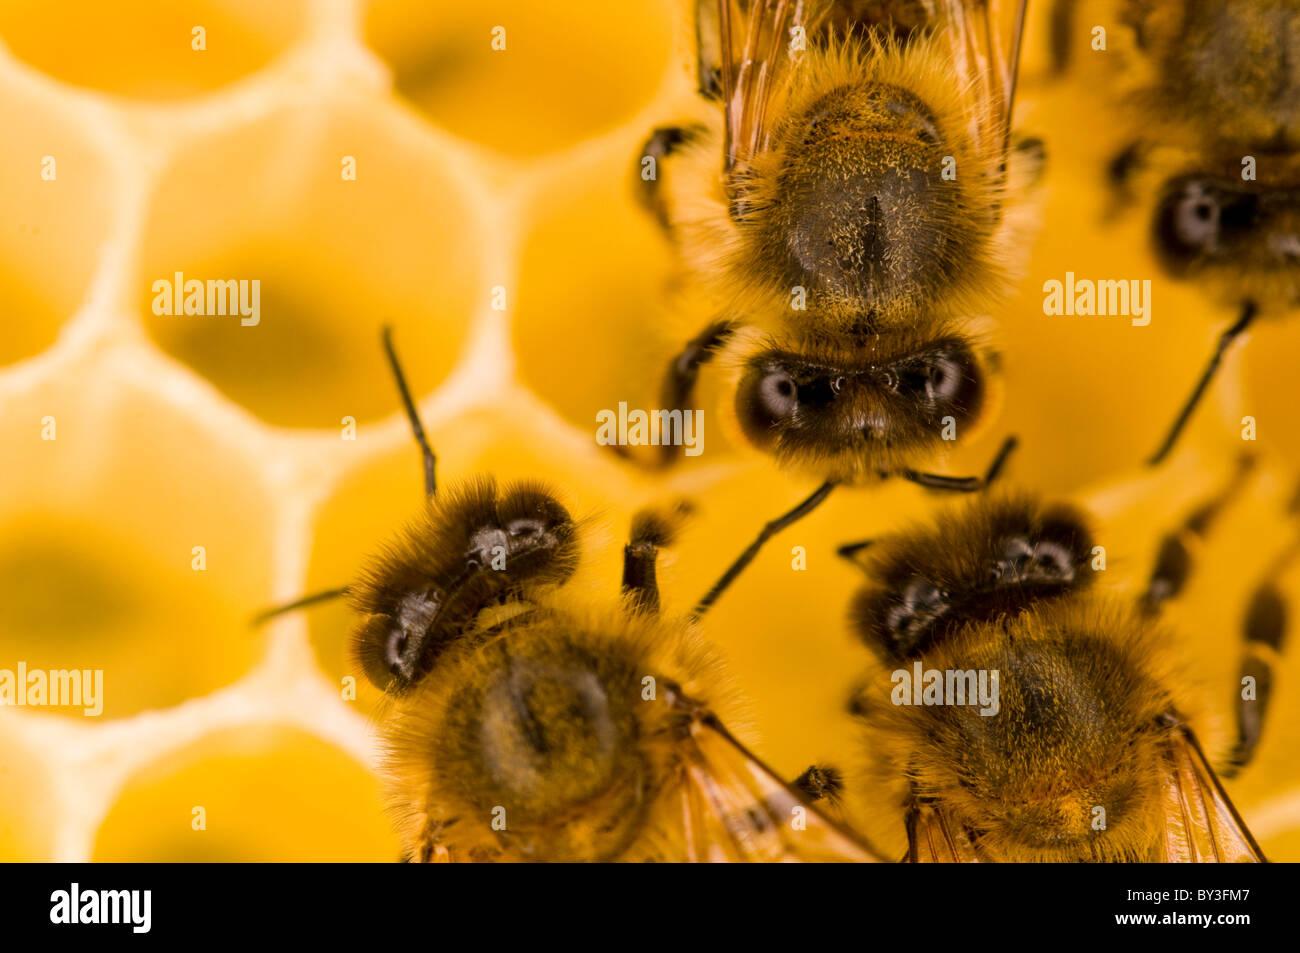 Las abejas melíferas Apis mellifera Foto de stock